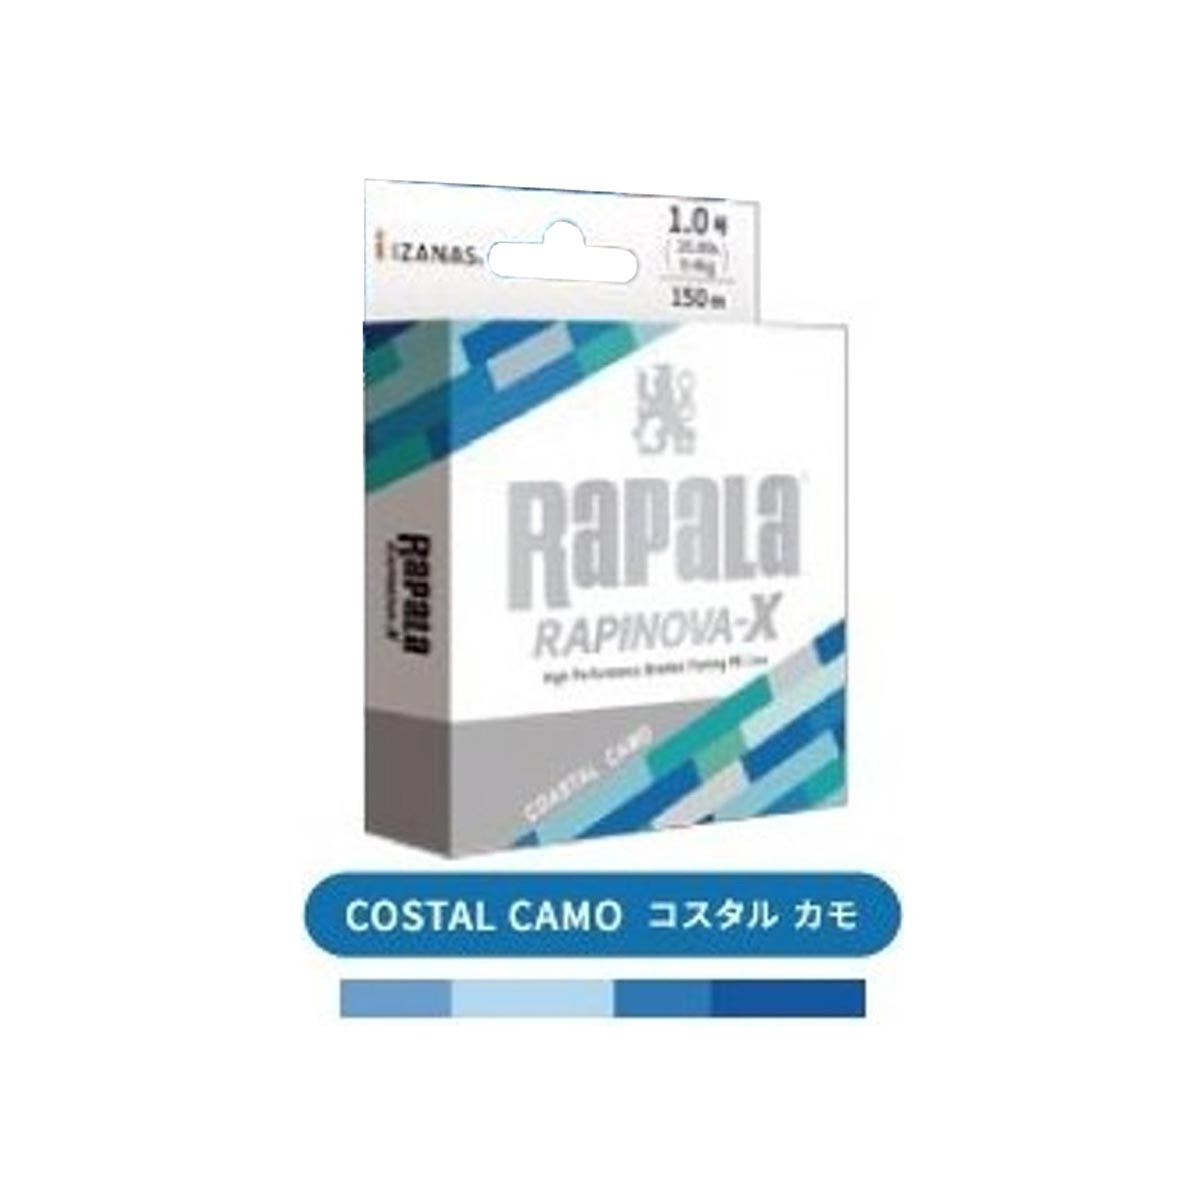 RAPALA RAPINOVA-X 150M COASTAL CAMO